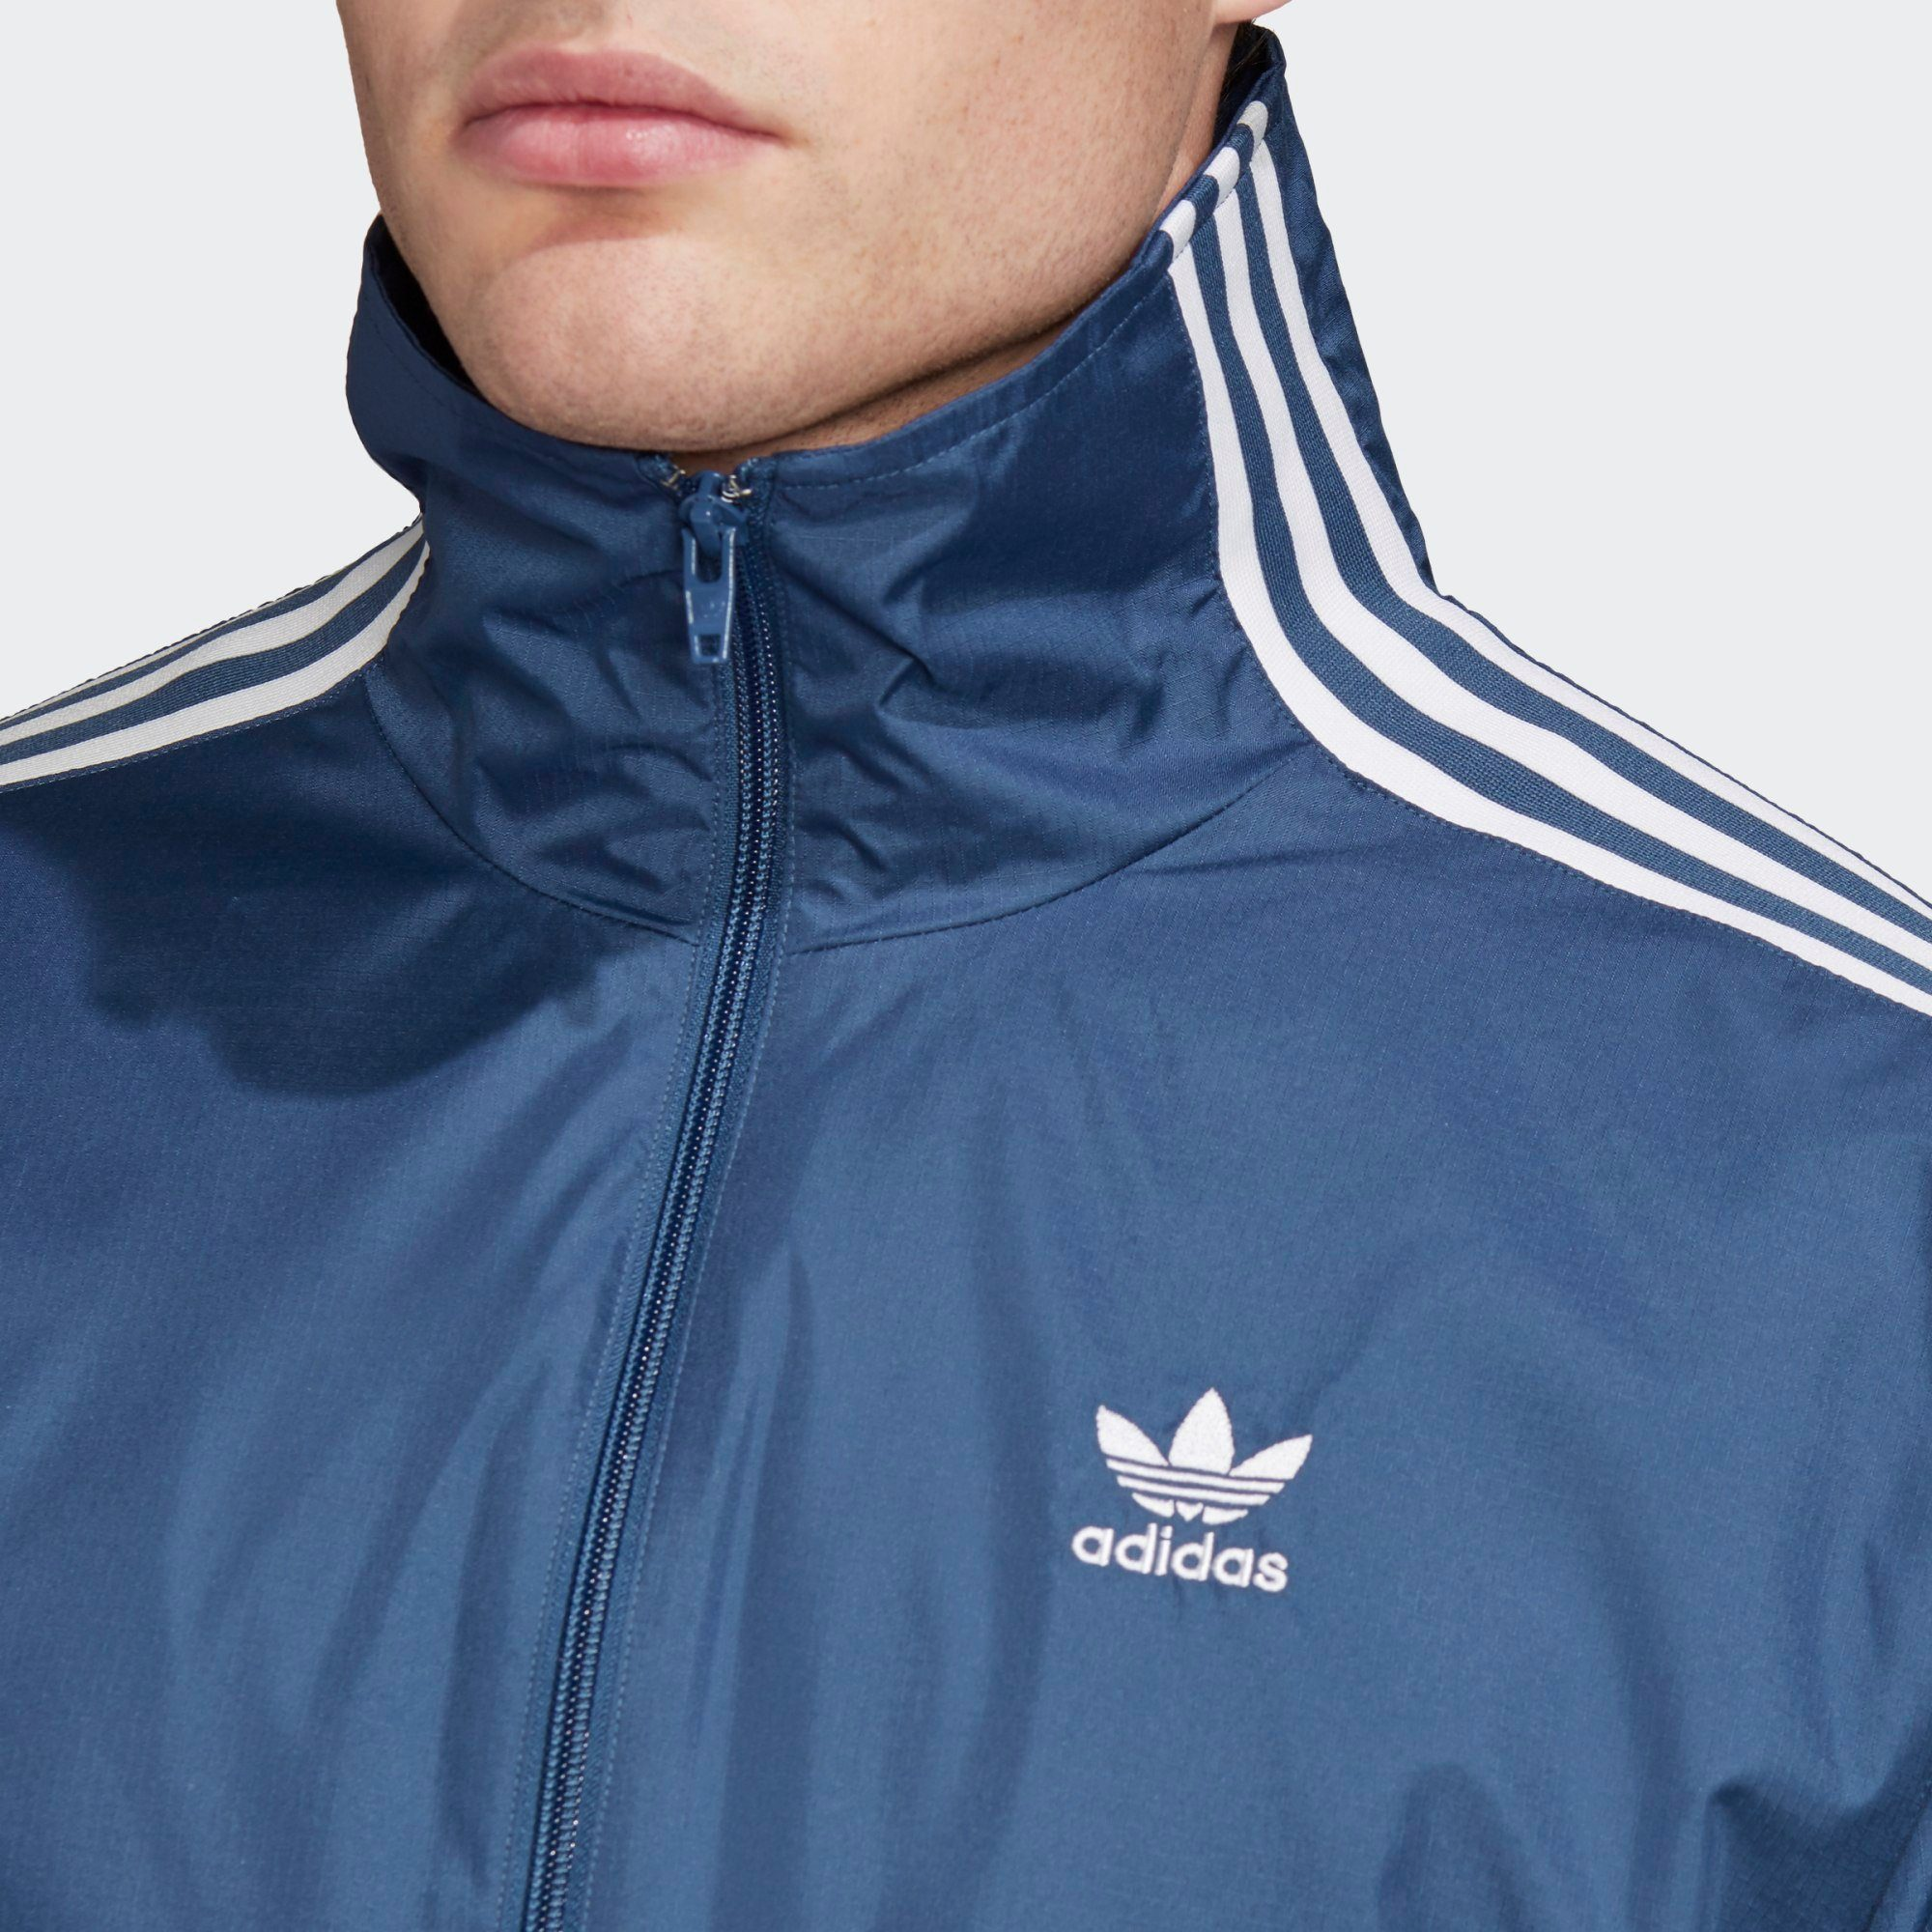 adidas Originals Sweatjacke Originals Jacke uPV1X6 UR01as